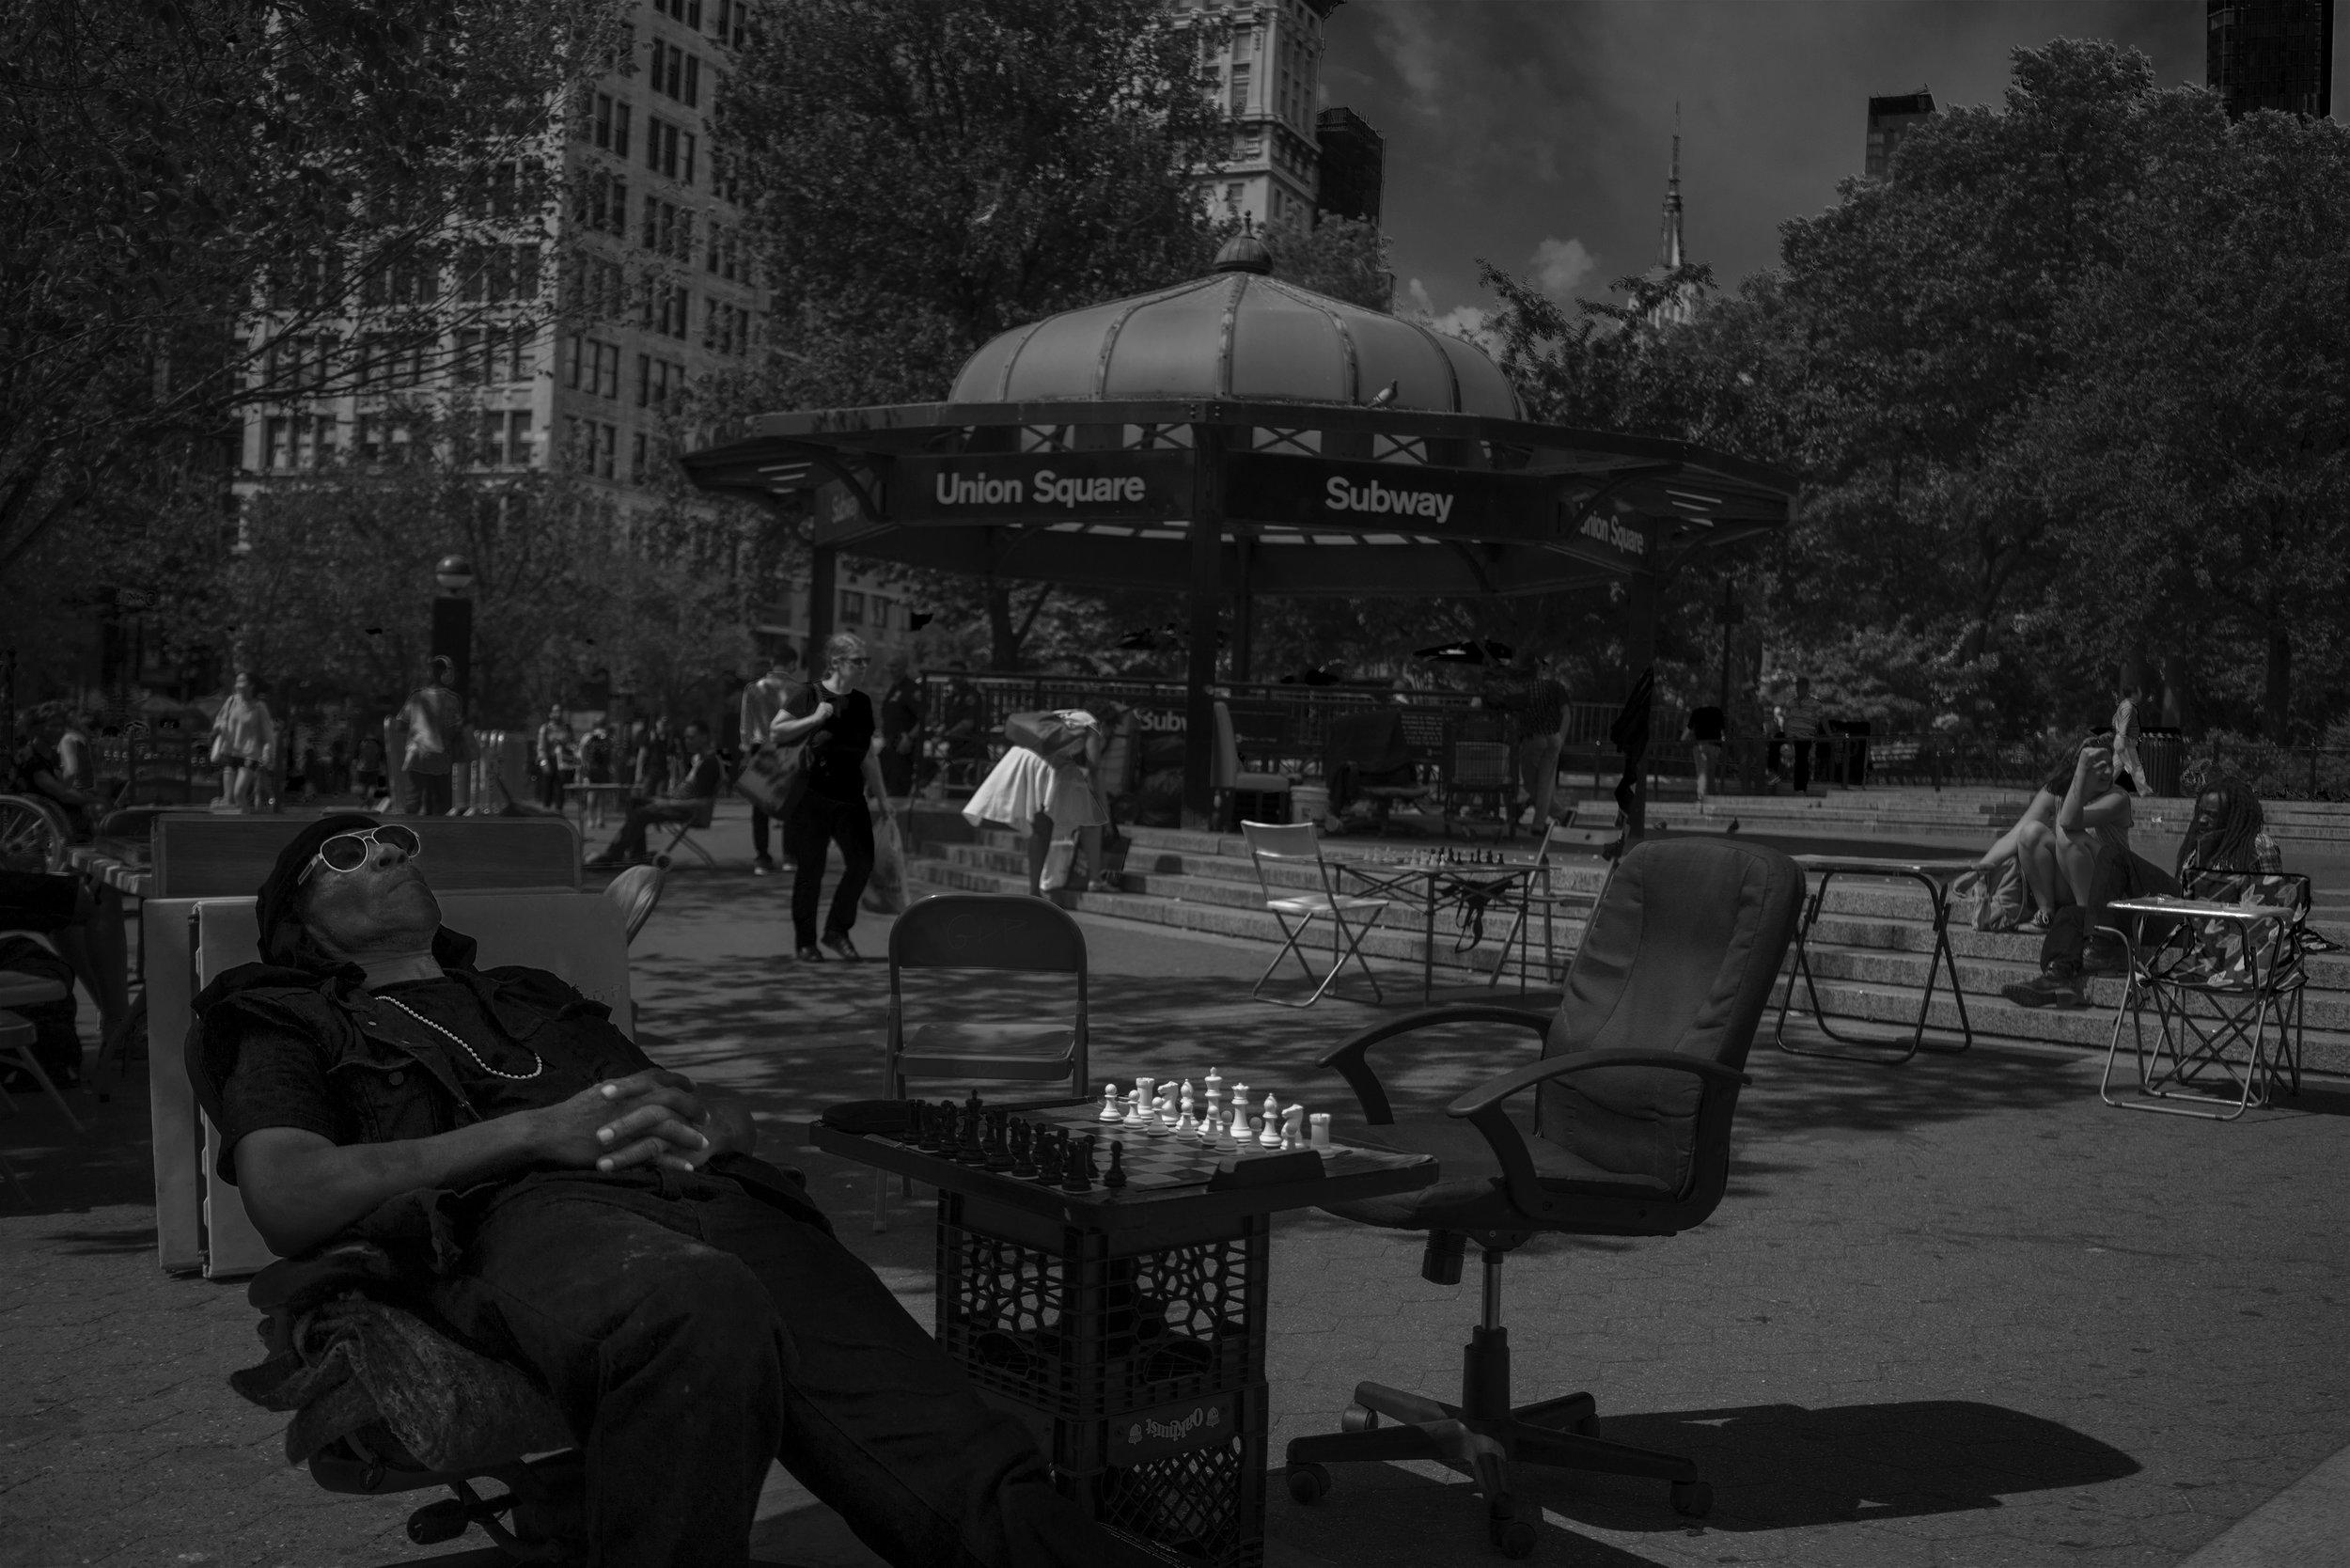 NYC_Street_2018_Sleeping_Chess_Player-001.jpg